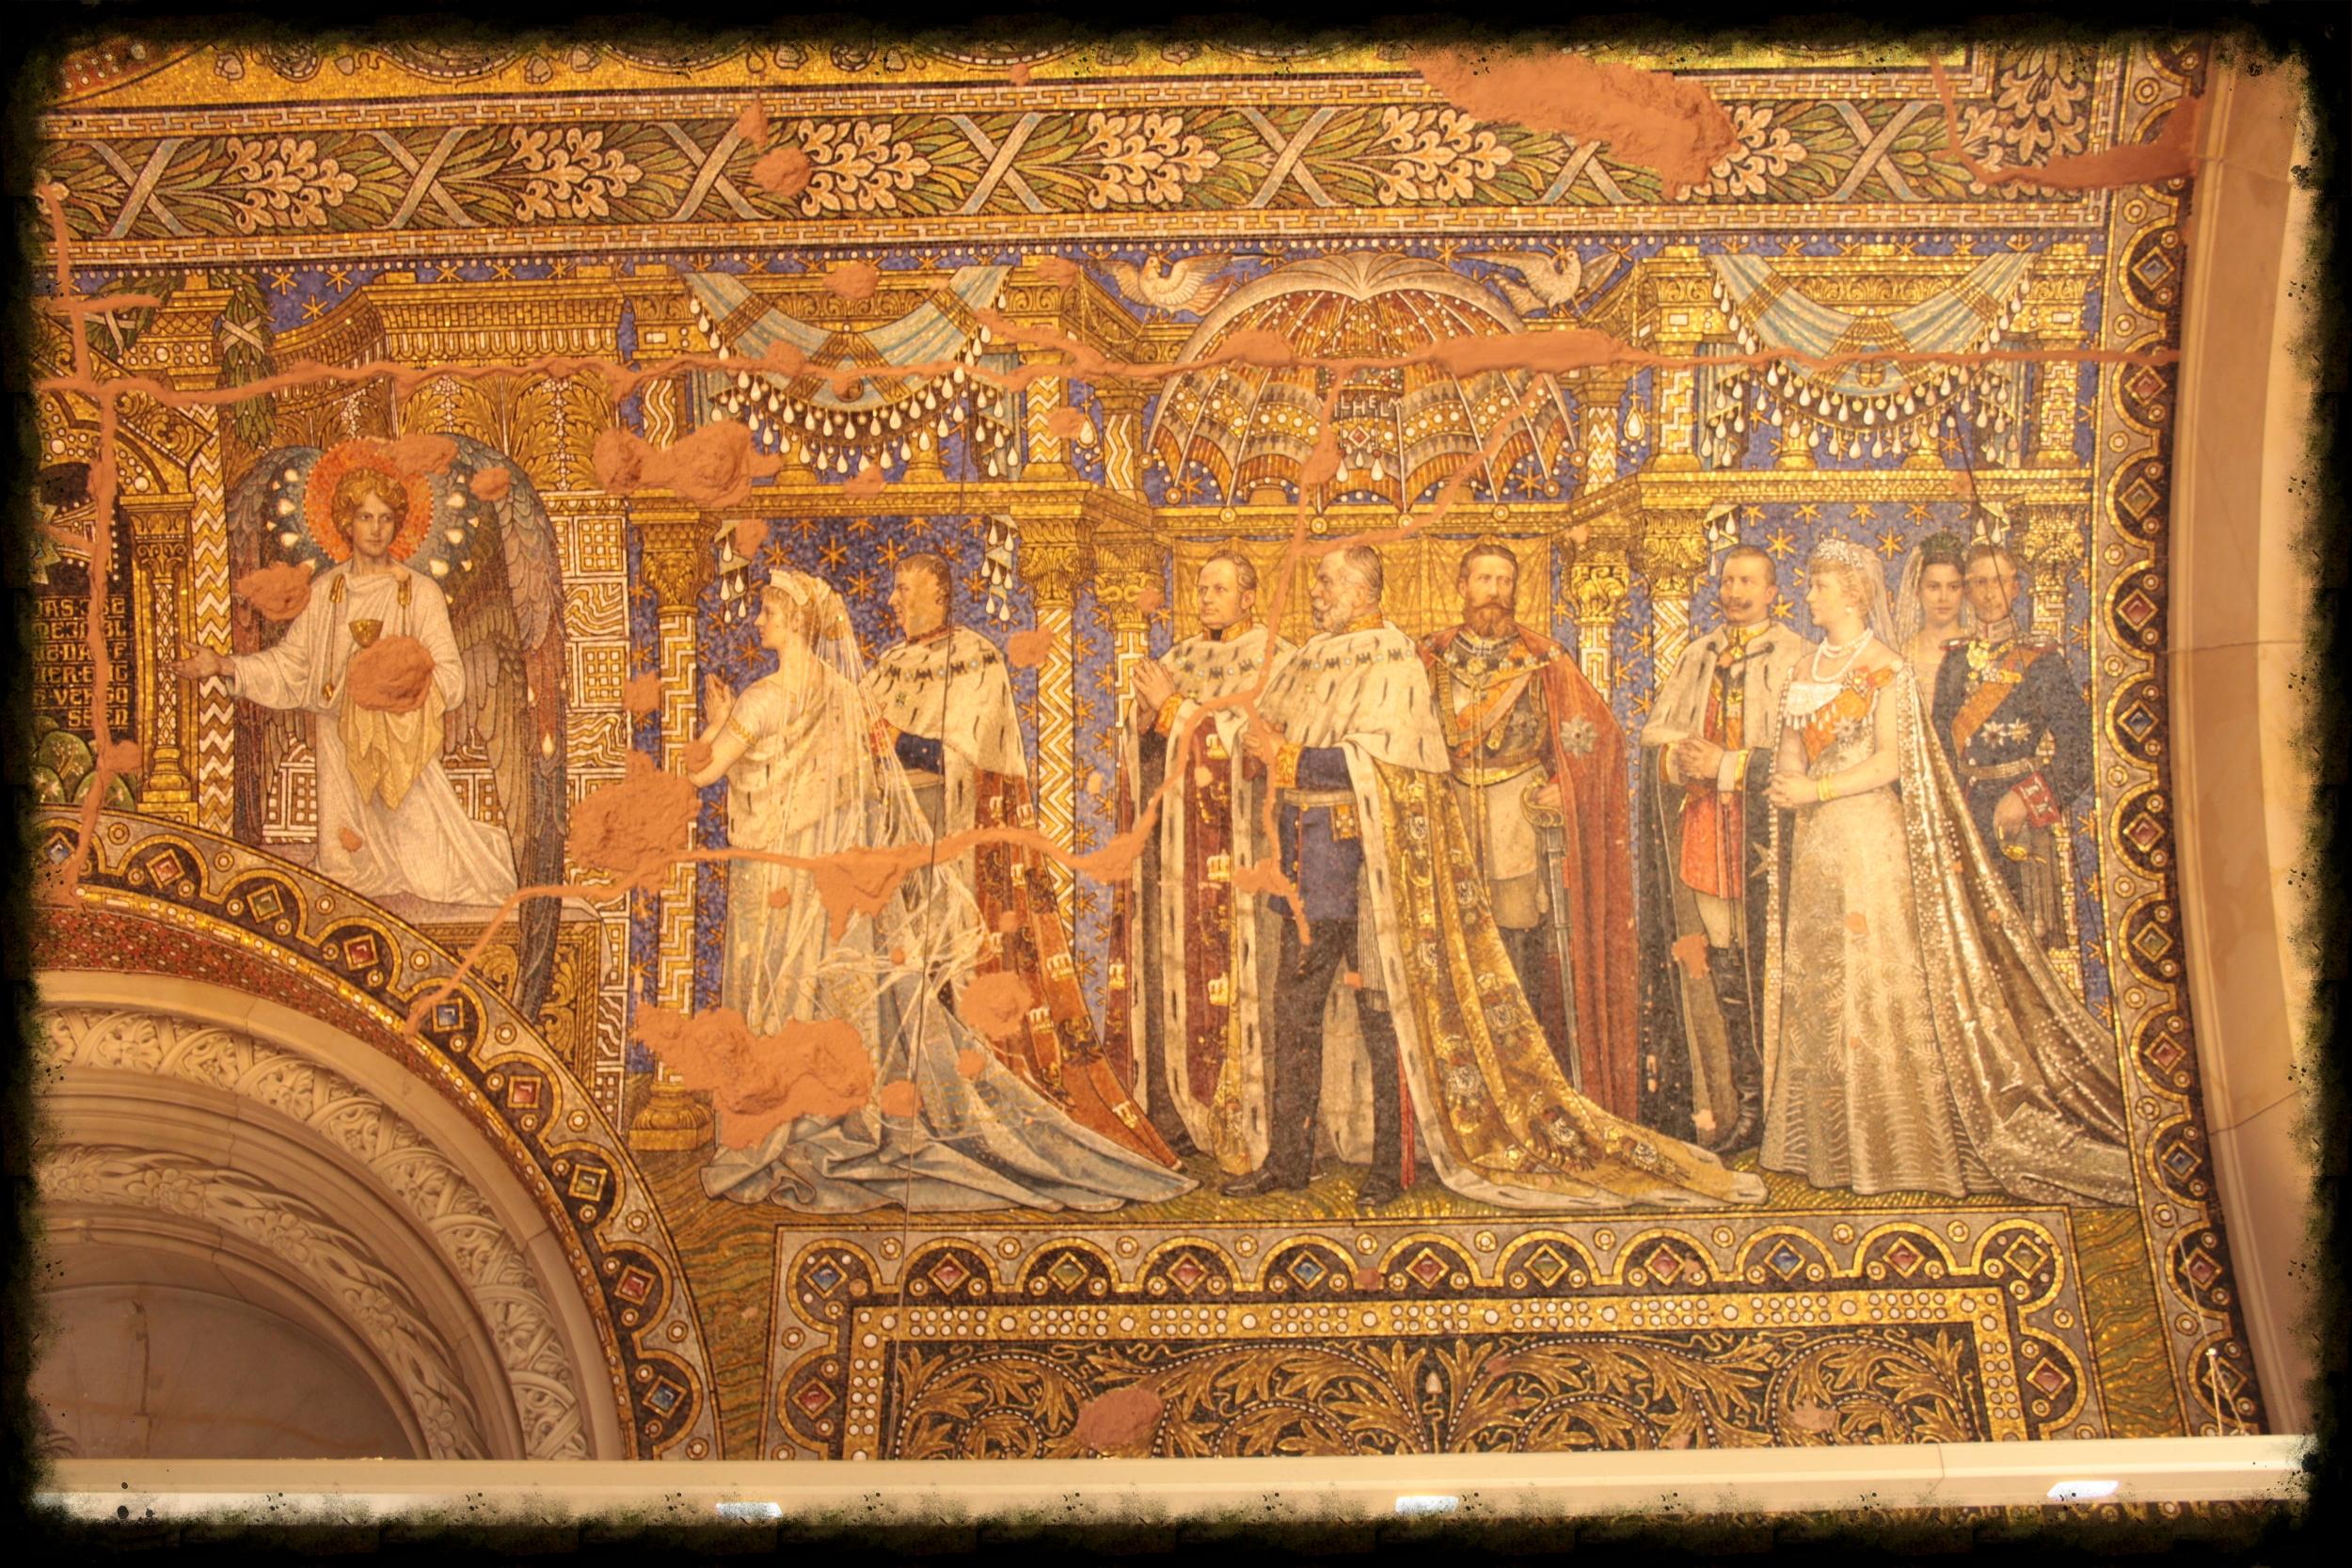 Artwork inside the 14th-century Wawel Cathedral, located inside Wawel Castle in Krakow, Poland.